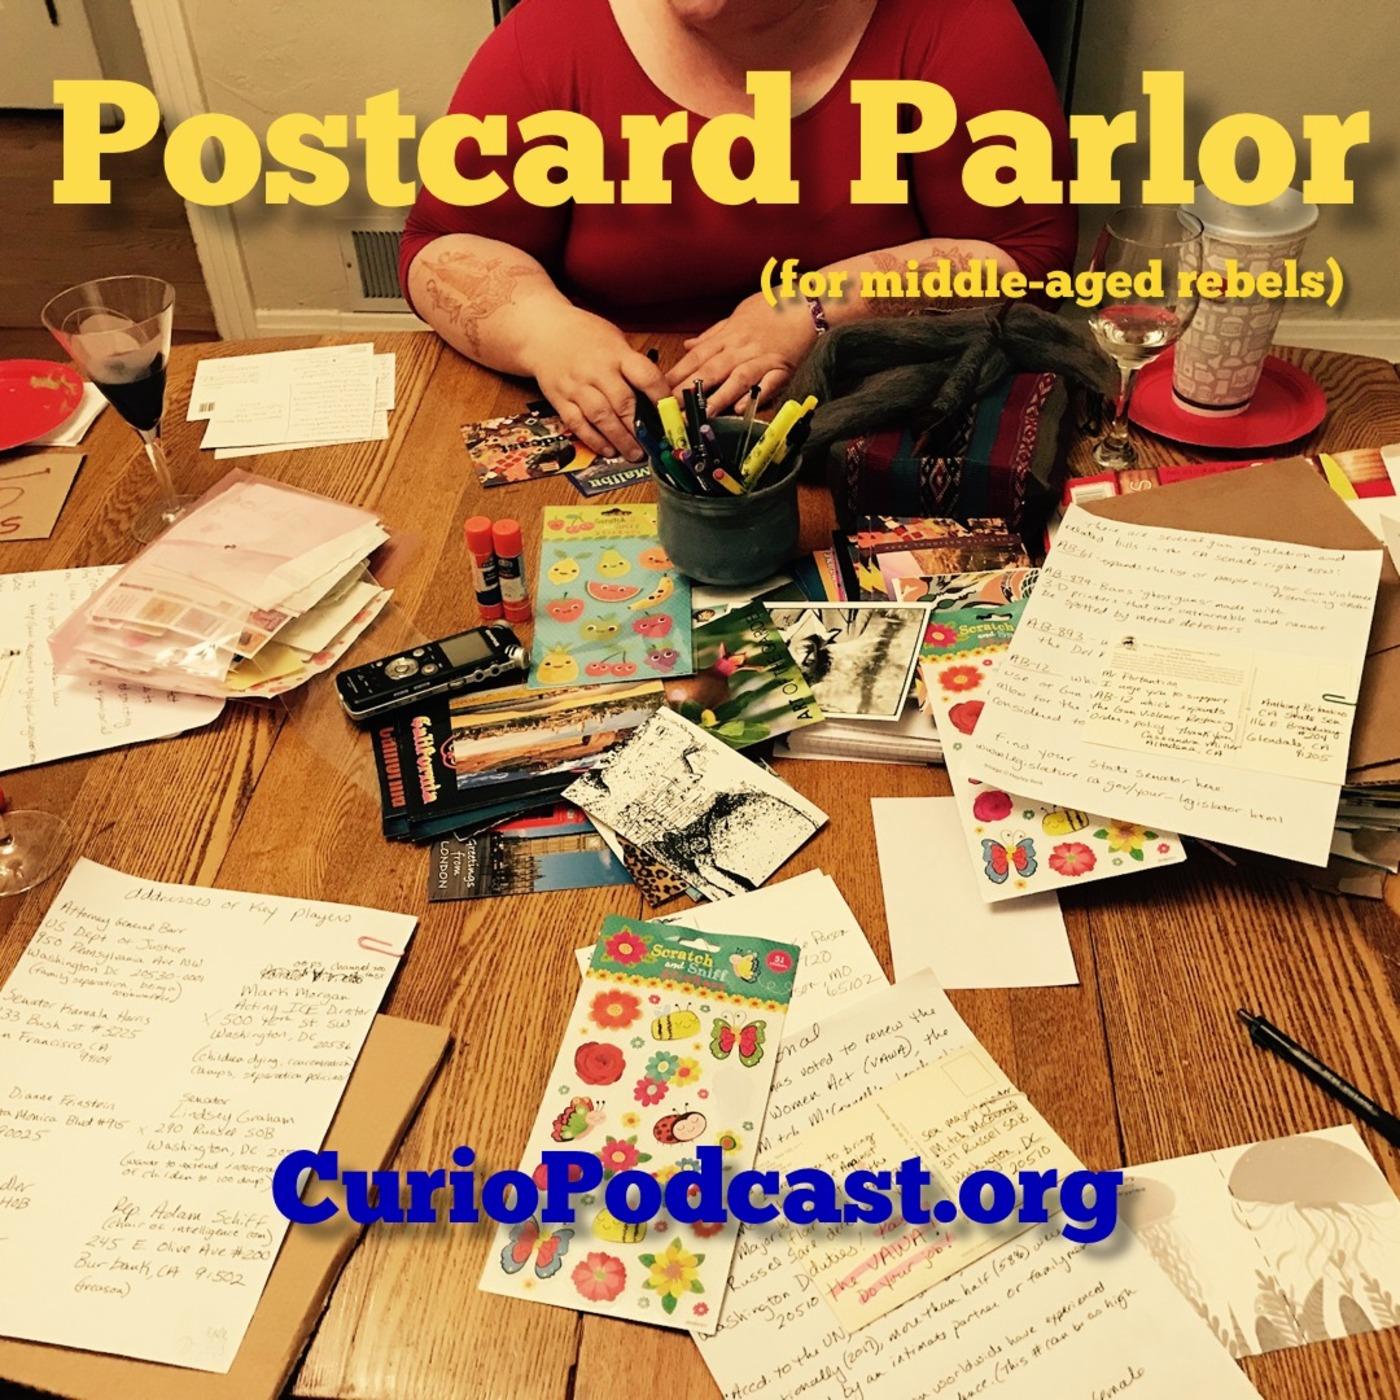 Postcard Parlor (for middle-aged rebels)